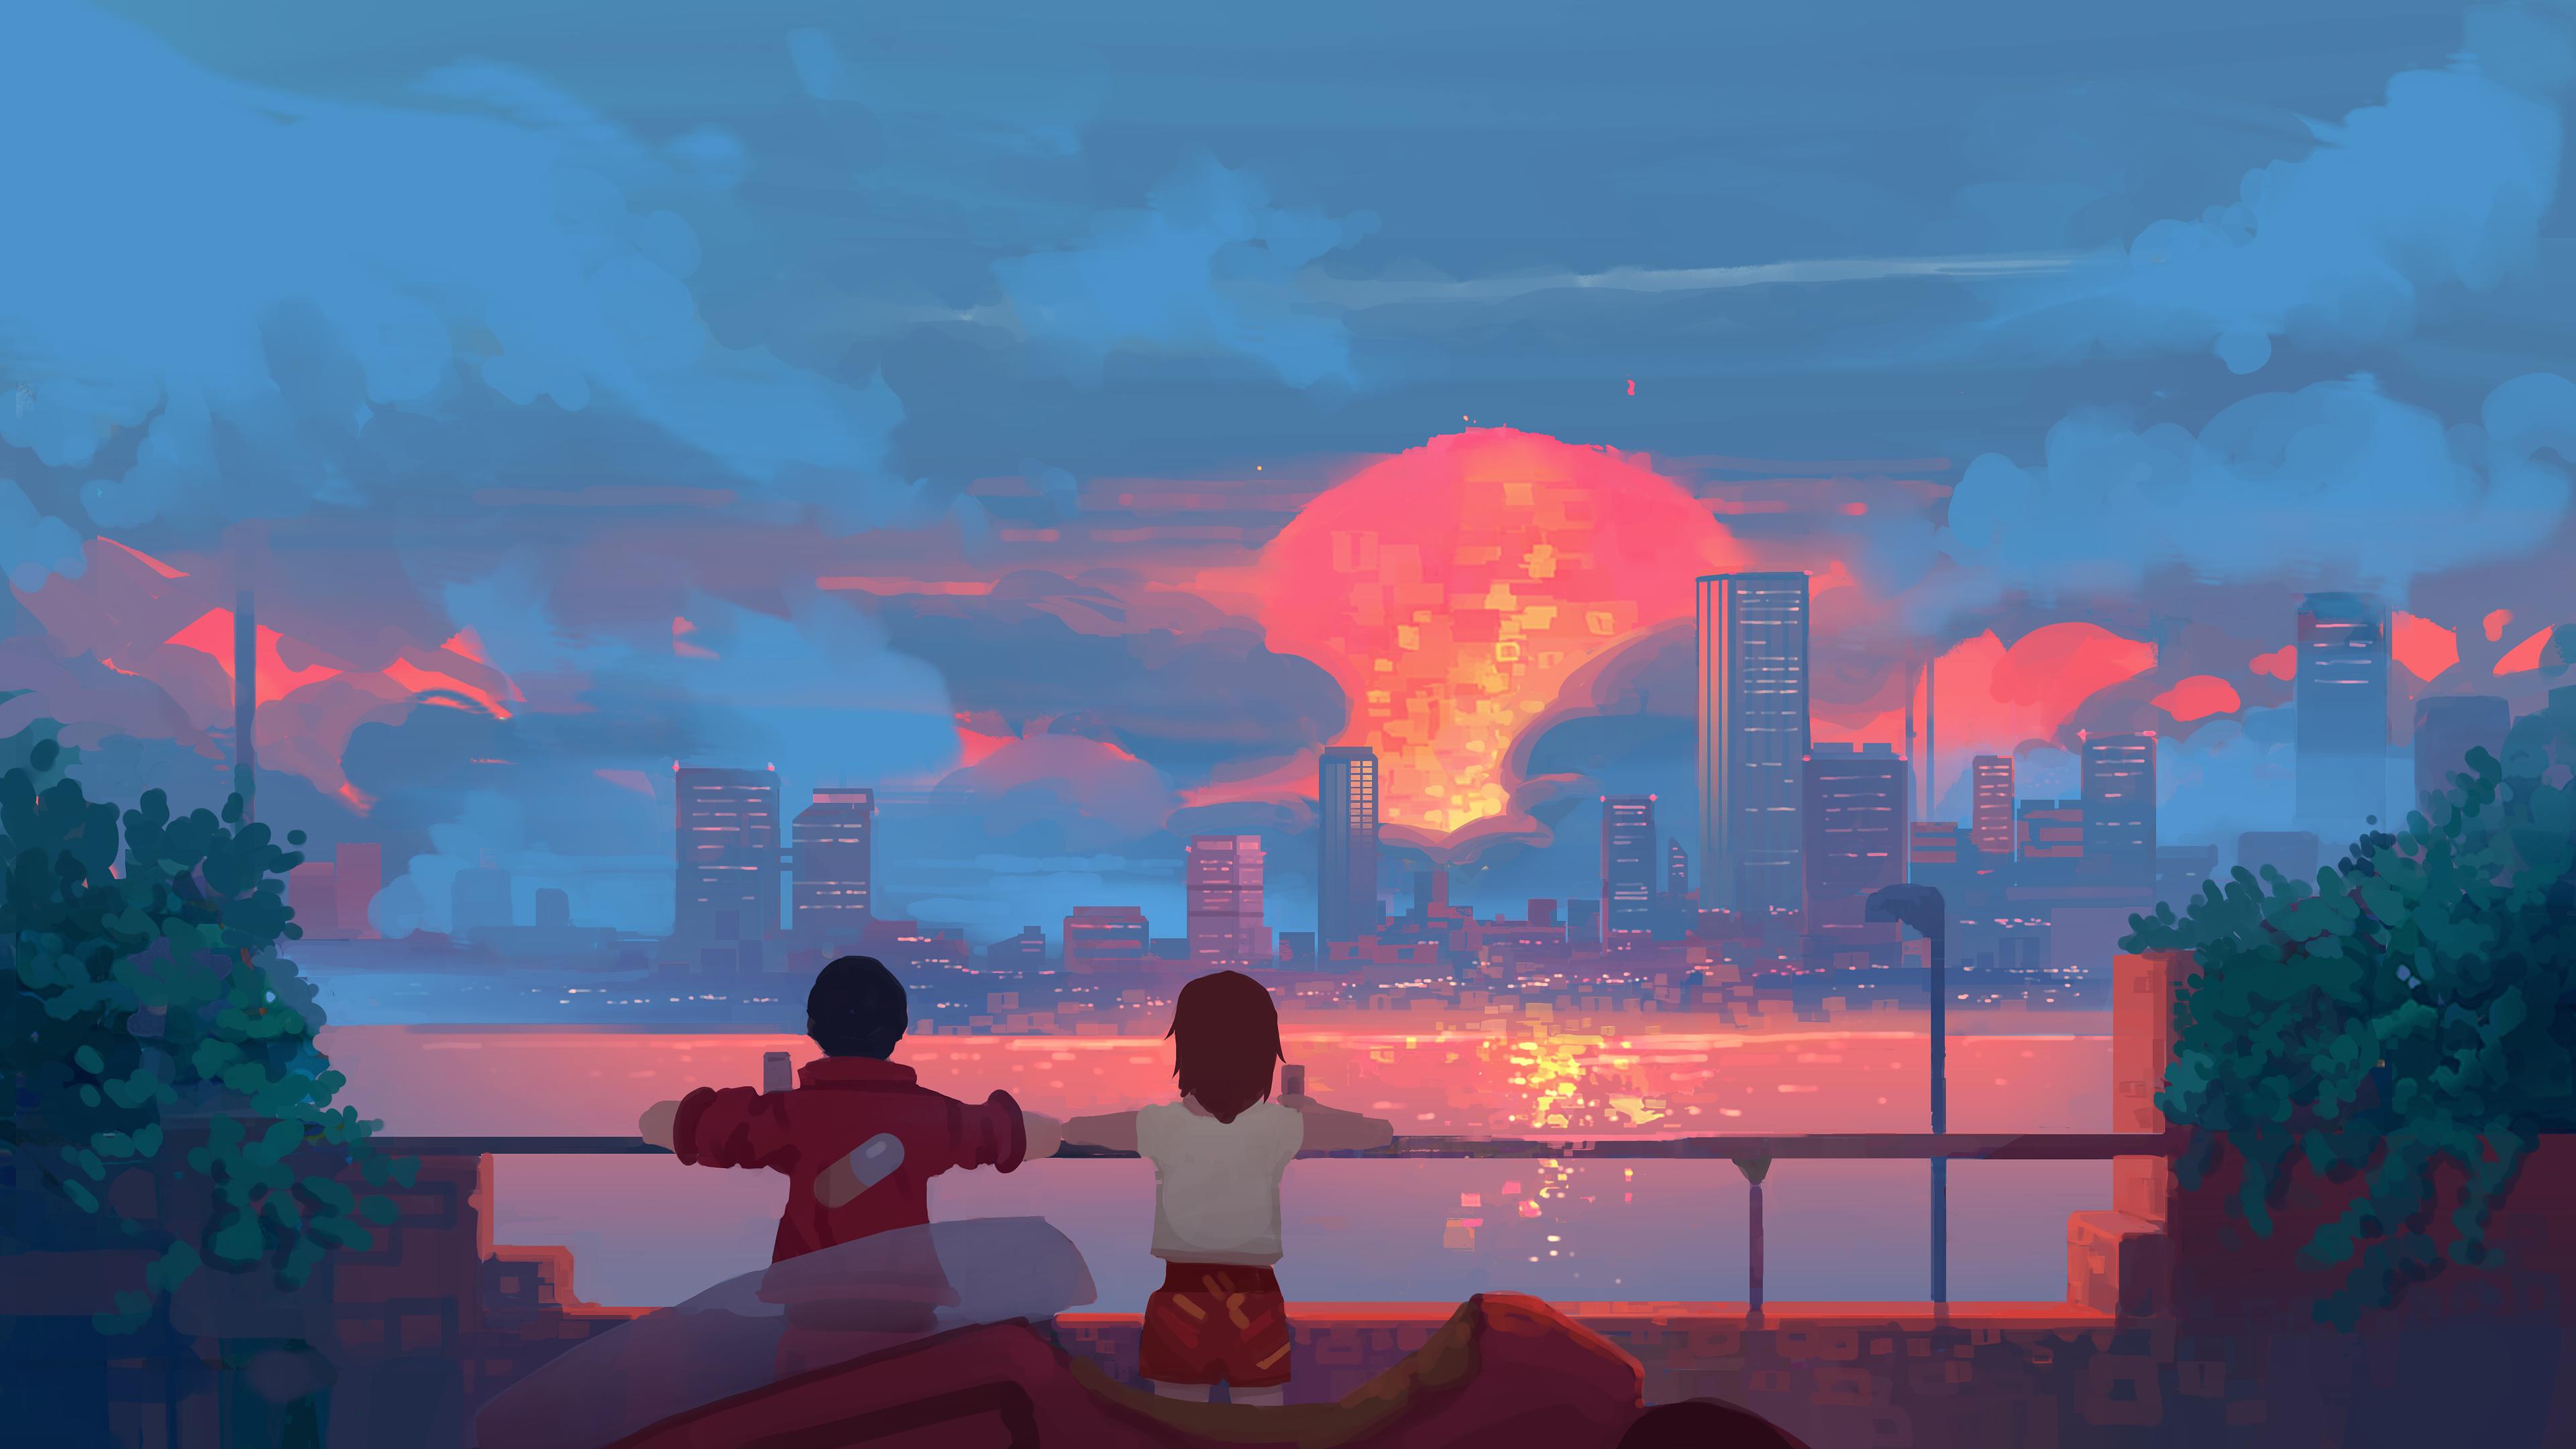 General 3840x2160 artwork digital art sunset city cityscape sea Akira moescape